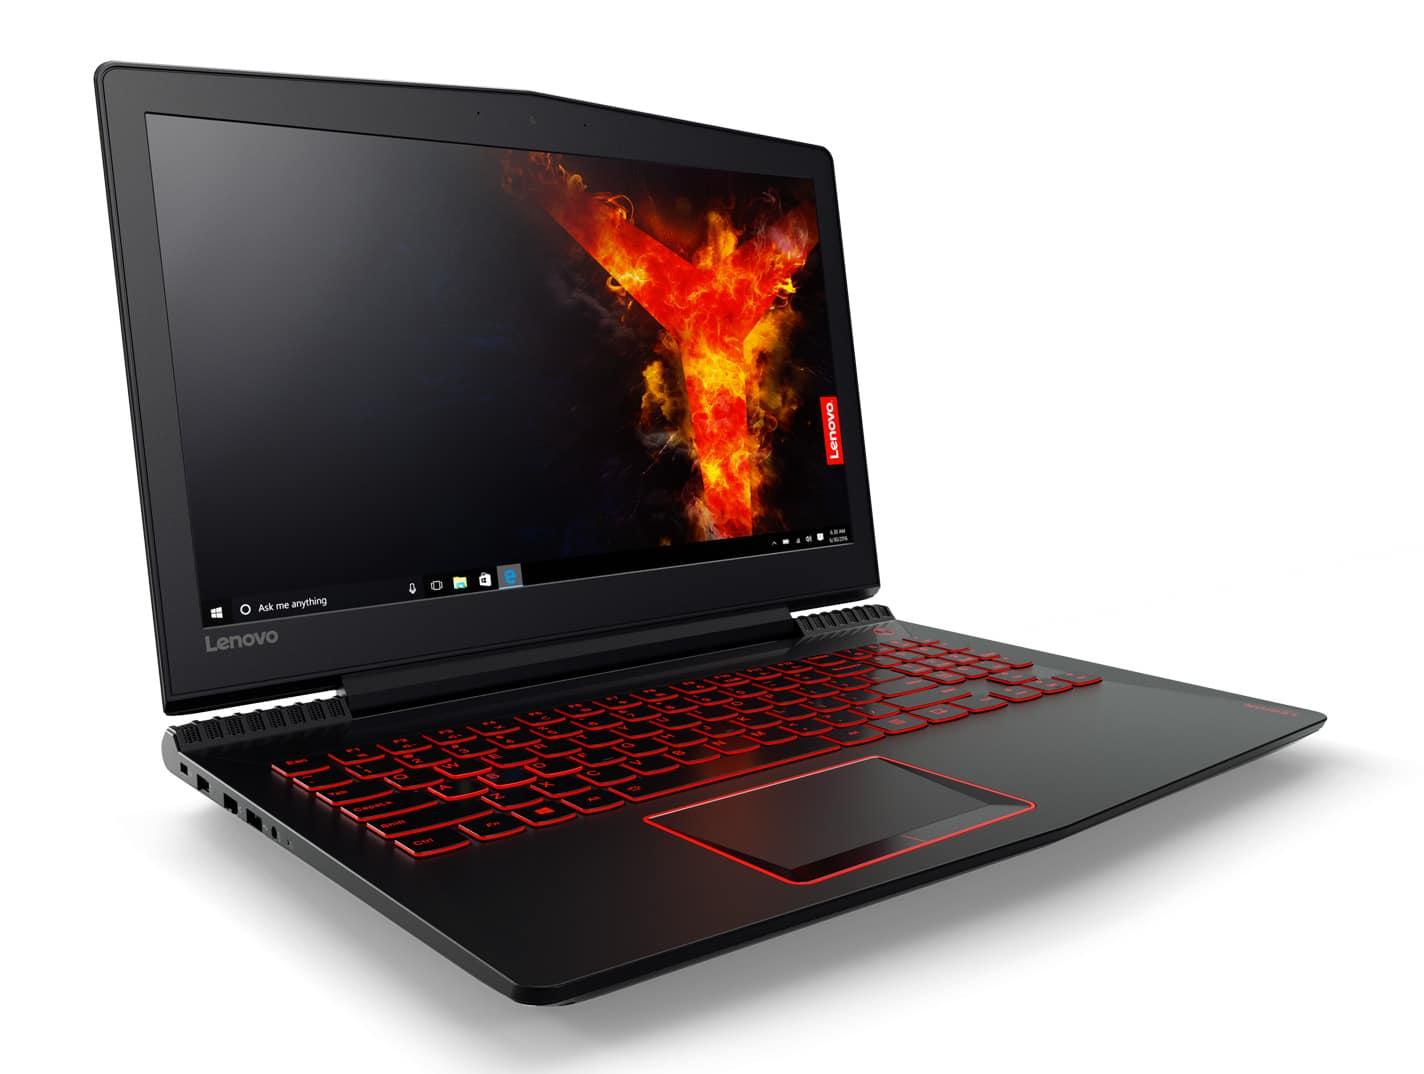 "Lenovo Legion Y520-15IKBN -015 à 899€, PC portable 15"" IPS GTX 1050 SSD"